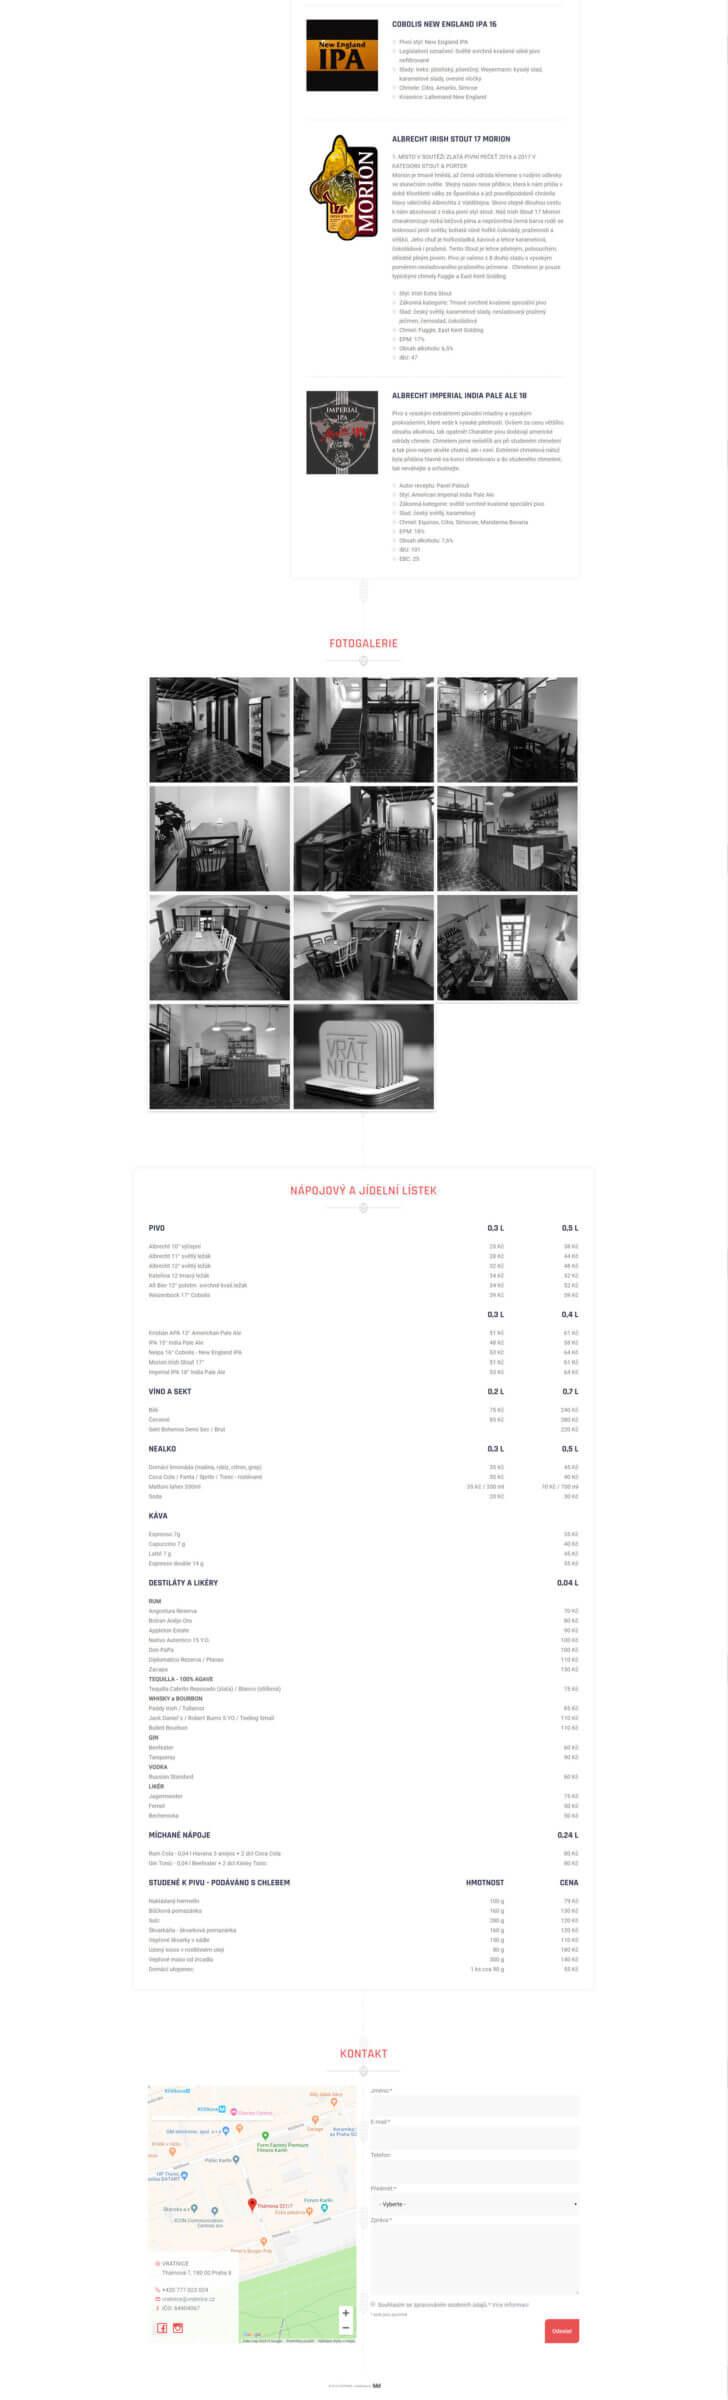 Tvorba webových stránek - onepage